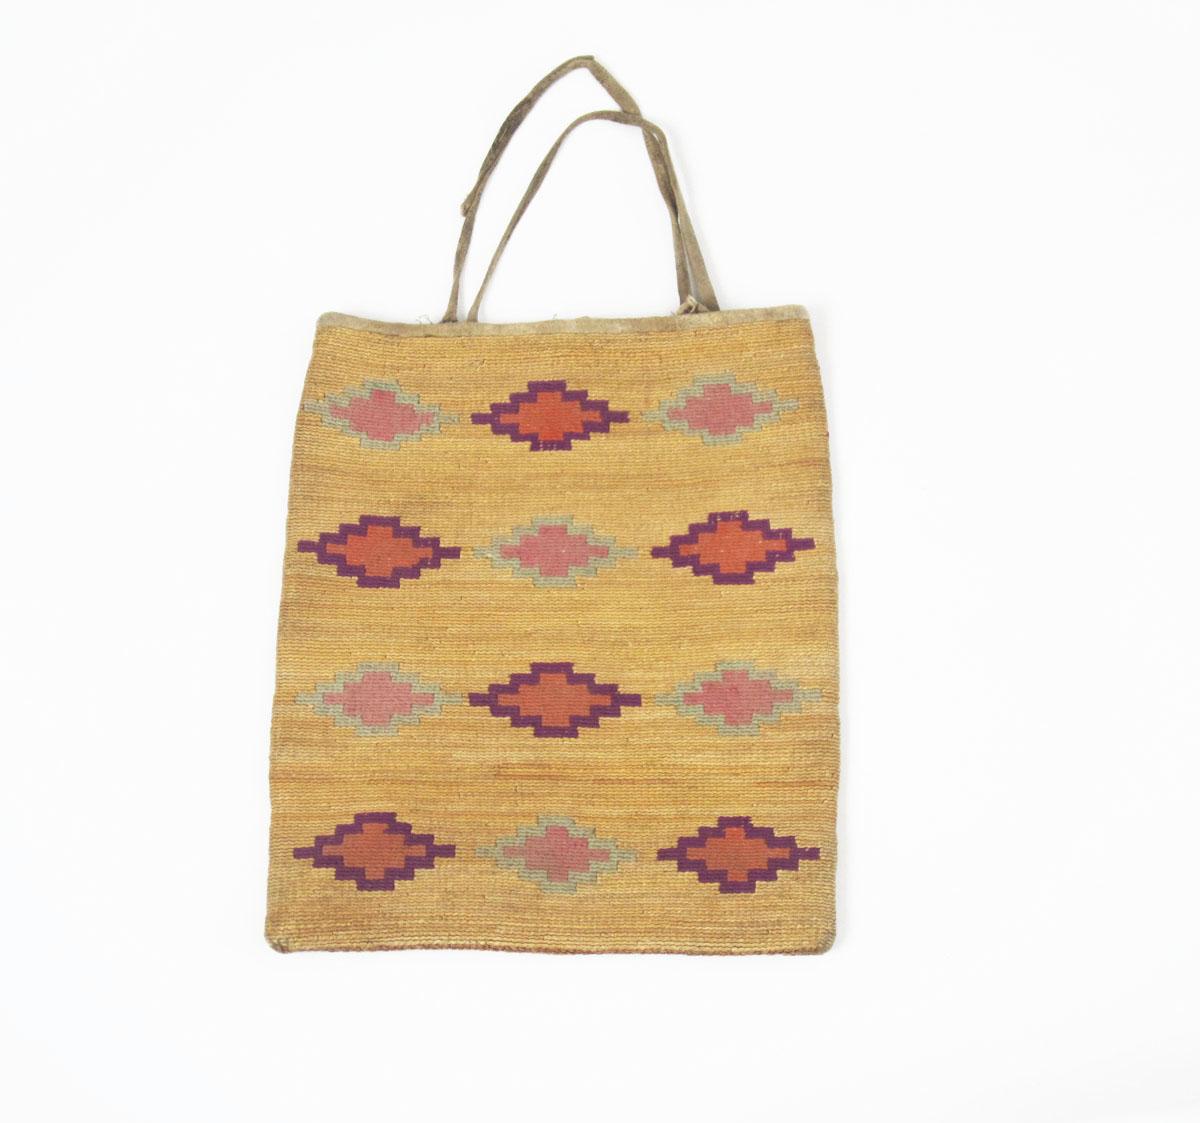 https://www.marcyburns.com/baskets-collection/nez-perces-cornhusk-bag-2